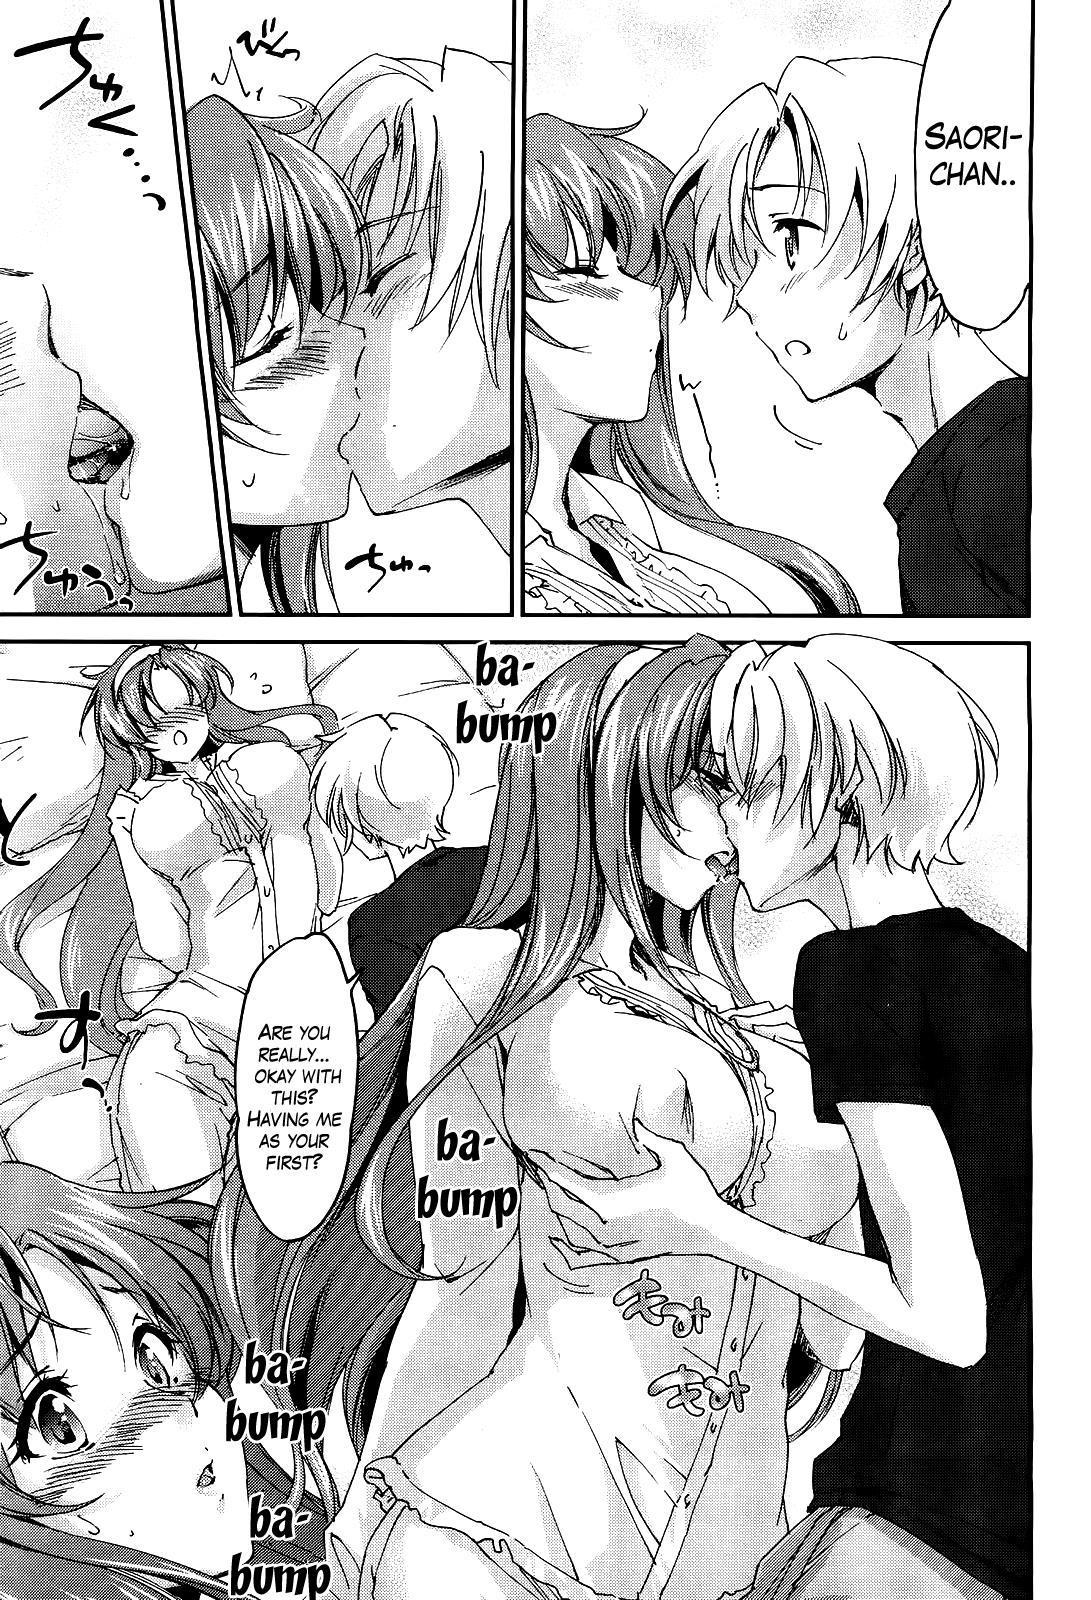 [Yuuki Homura] Onee-chan! Tengoku   Sister Paradise Ch. 1-4 [English] [The Lusty Lady Project] [Decensored] 73